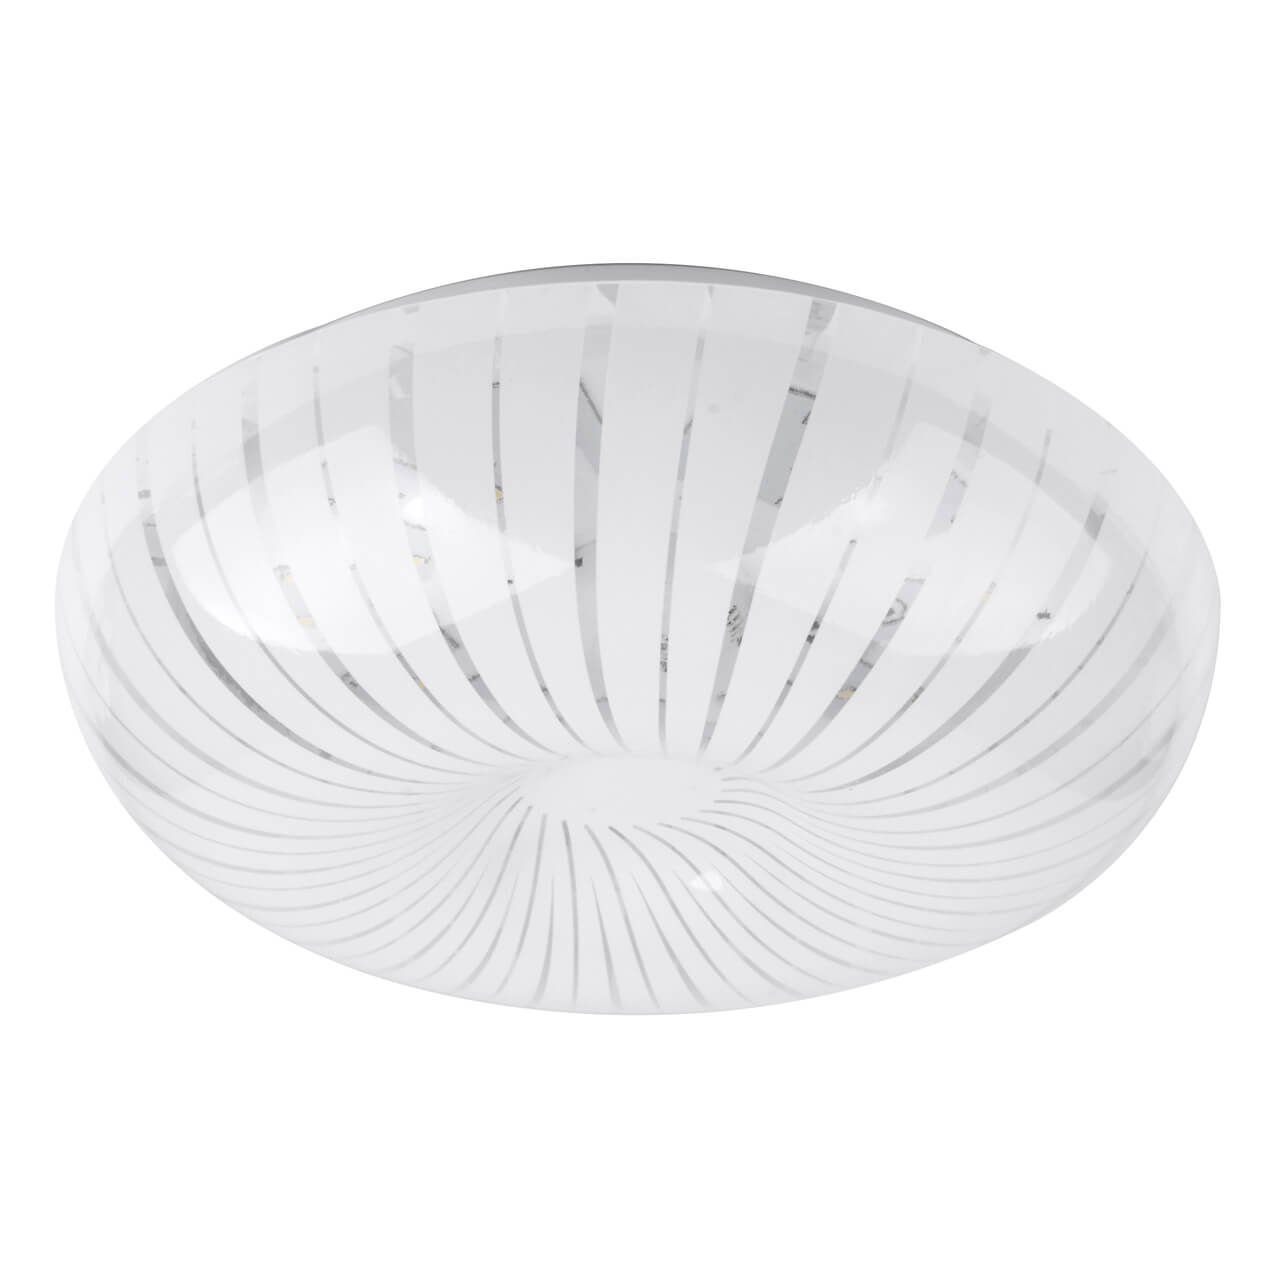 Светильник ЭРА SPB-6-12-6,5K (A) Медуза